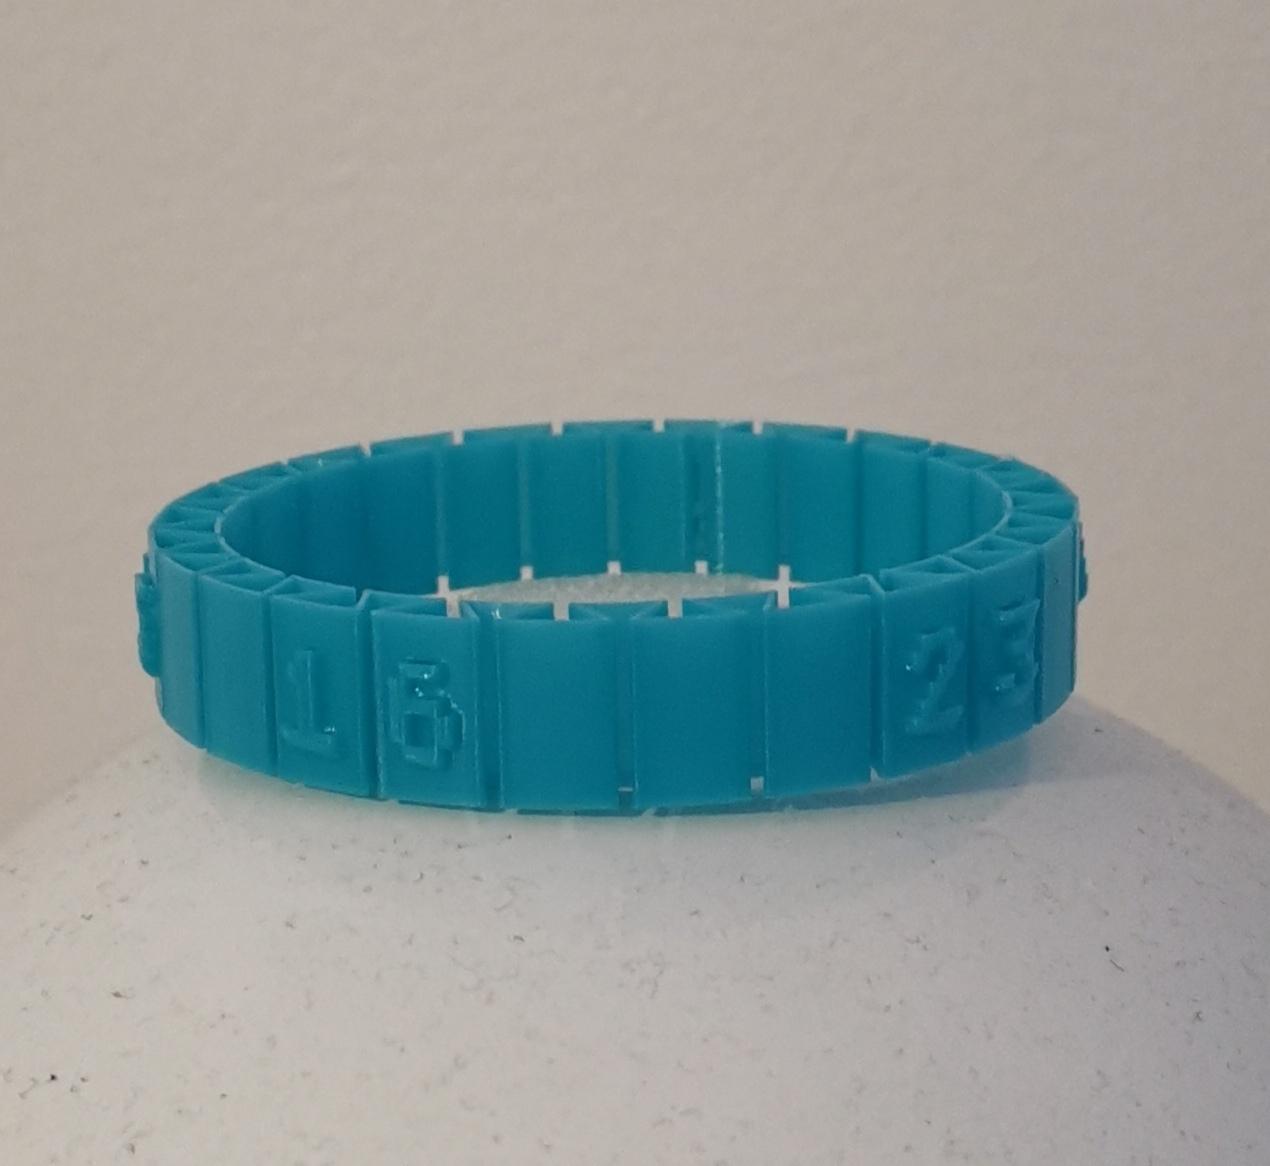 lottery.jpg Download free STL file Lost Numbers Bracelet • 3D printer object, alpo16000